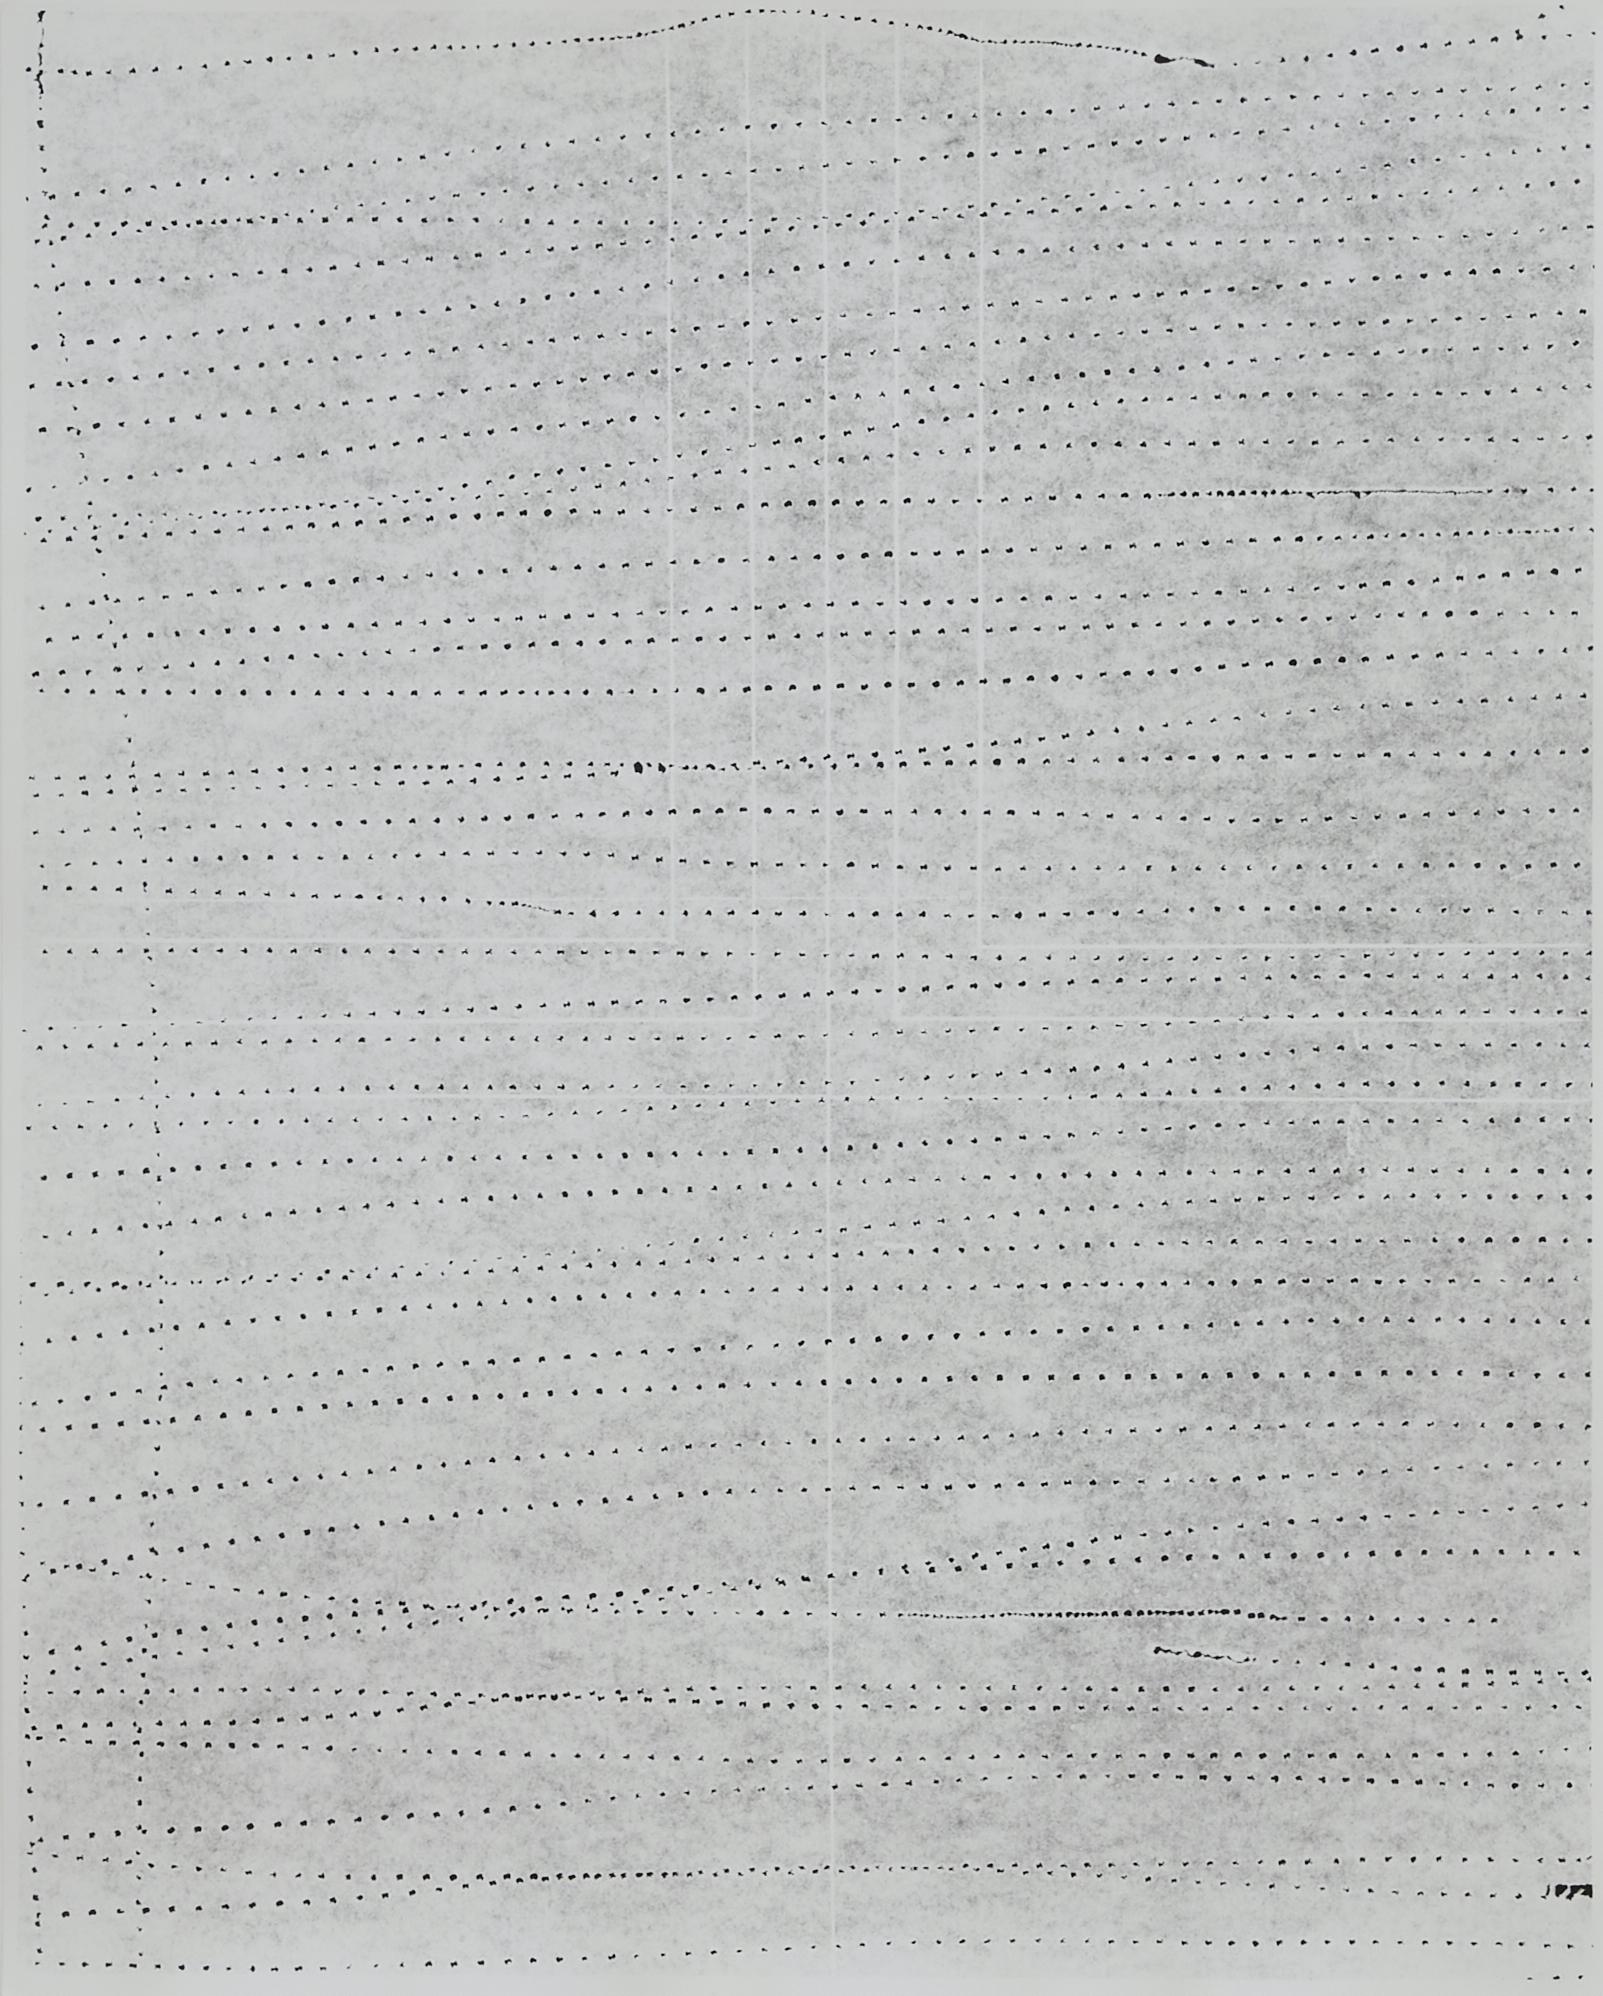 Practice Piece (Sewing Excerise #8W), 2019, Silver gelantin print, 53 x 40cm